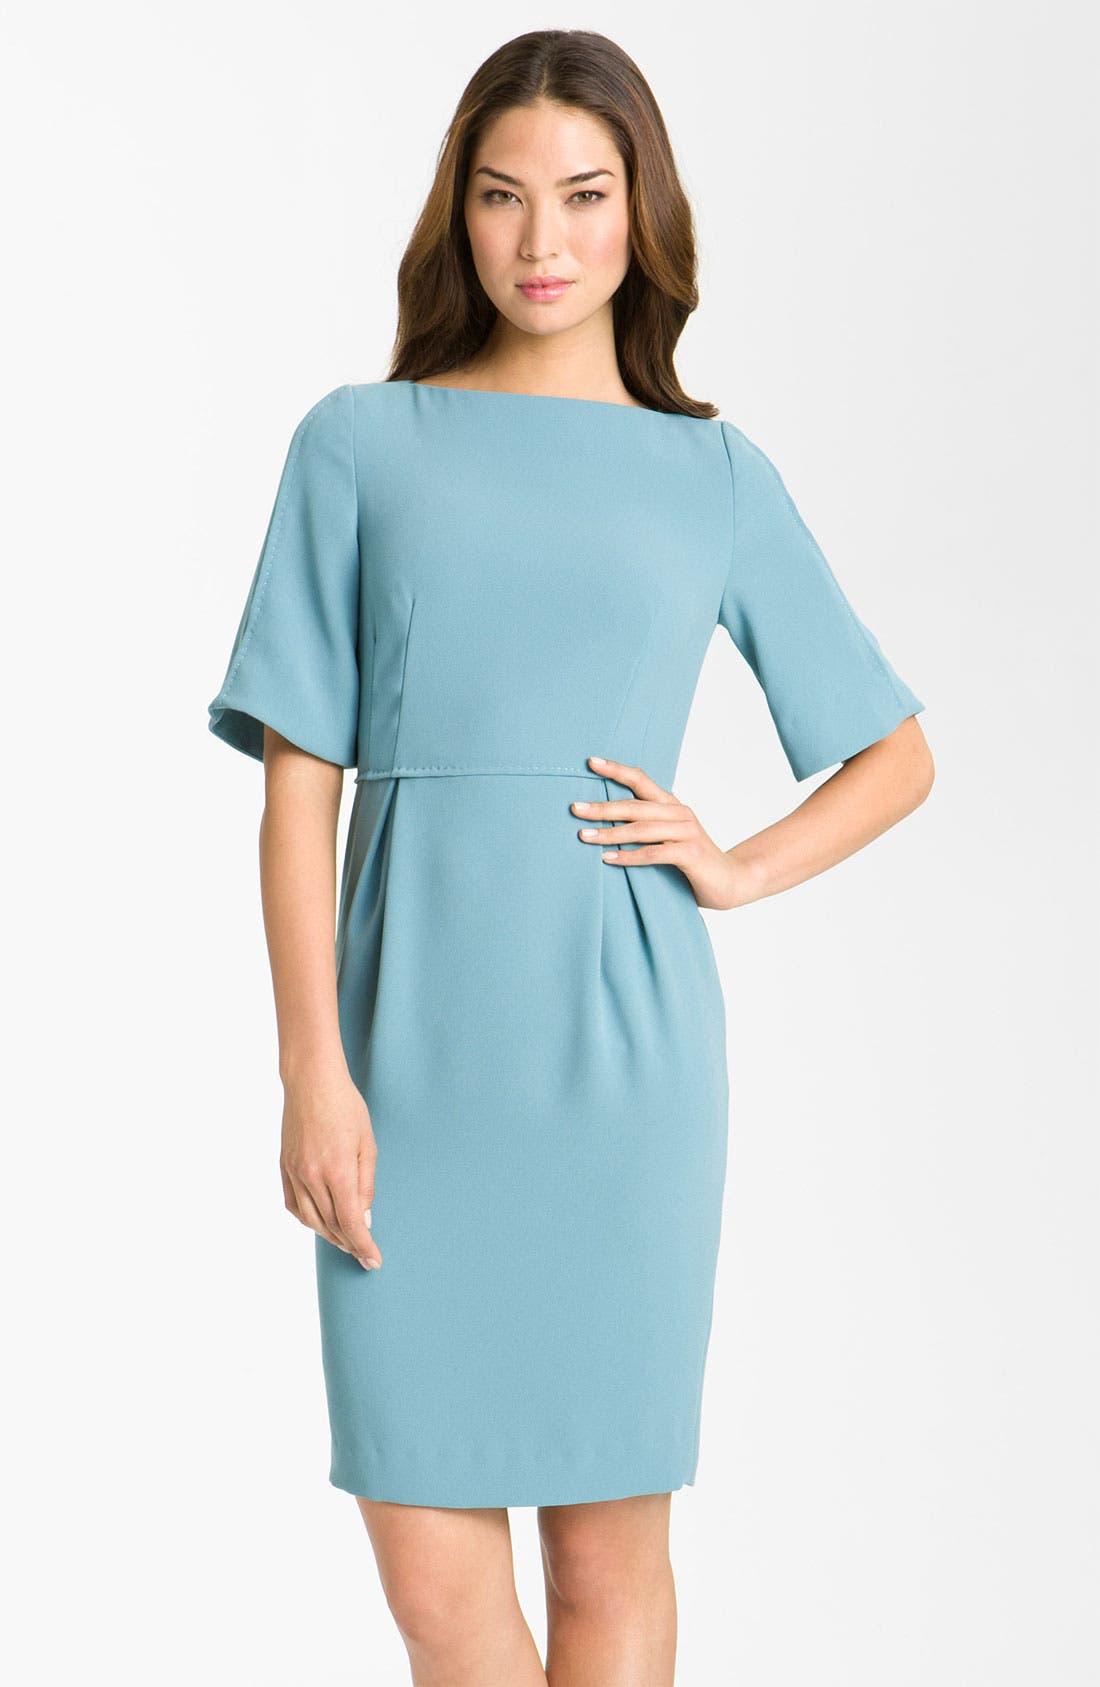 Alternate Image 1 Selected - Rachel Roy Boatneck Dress